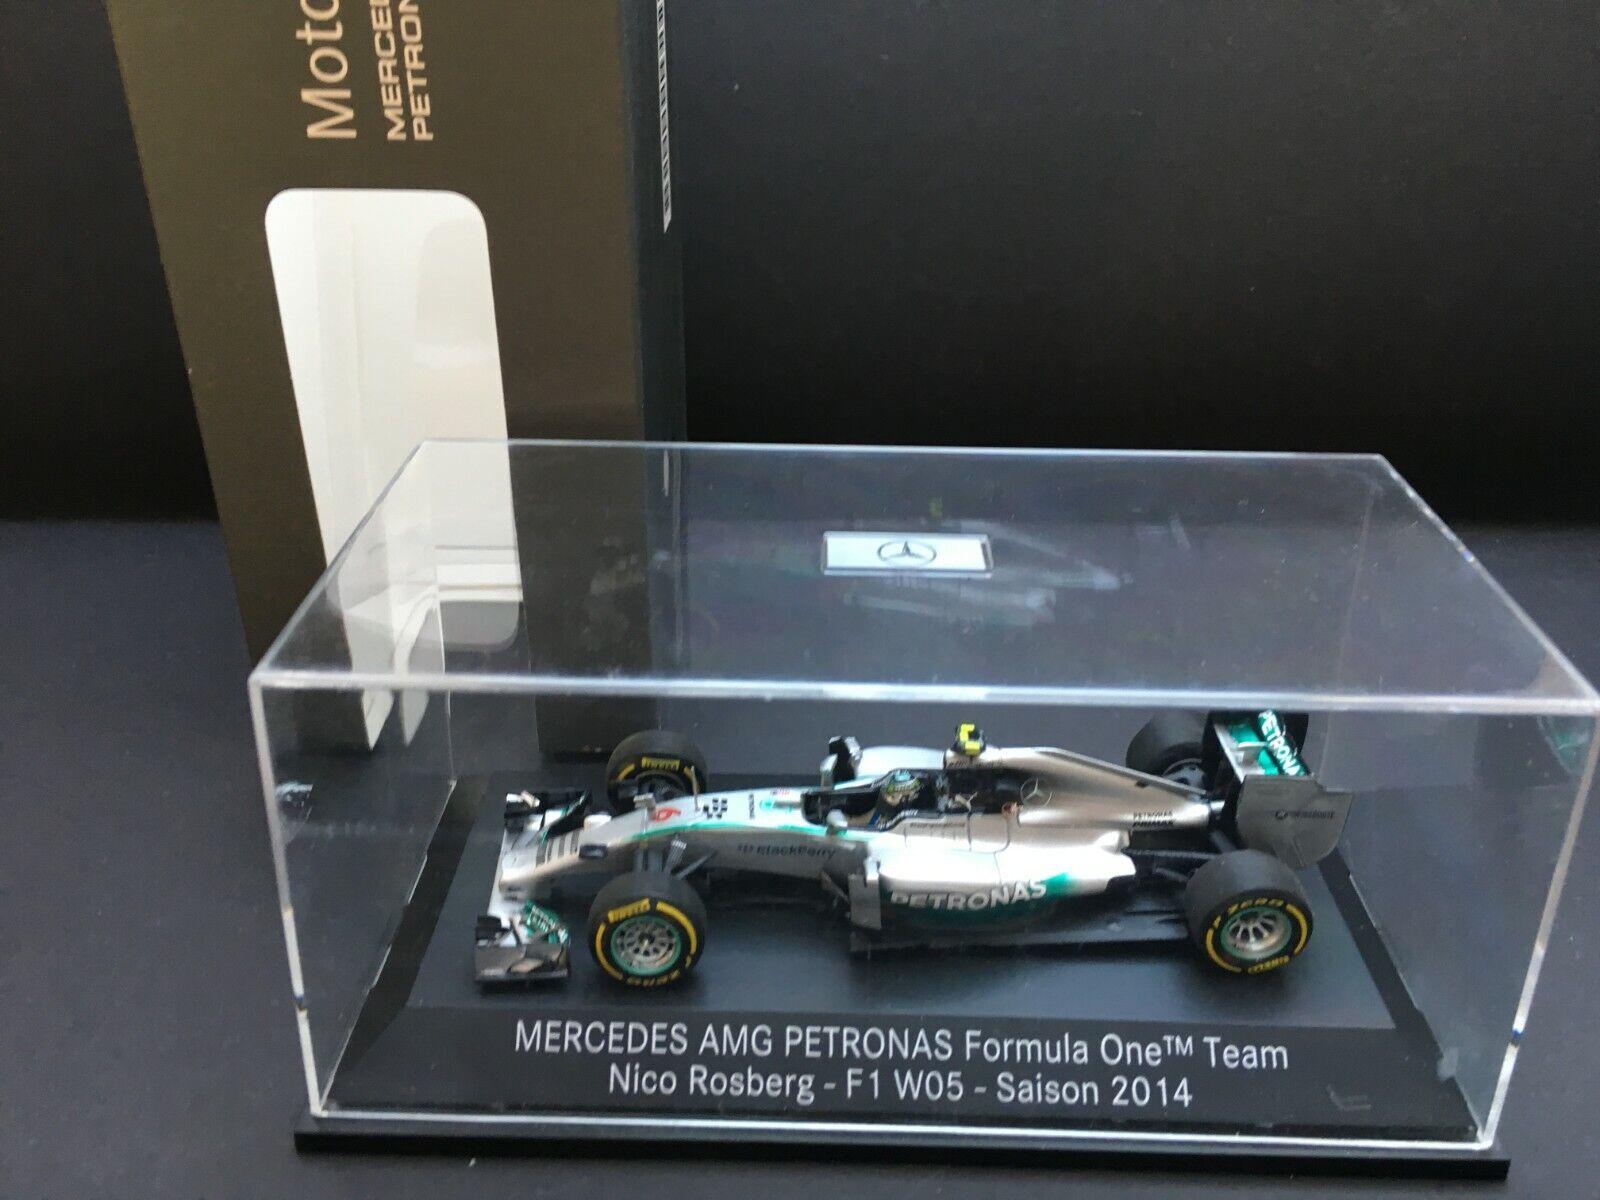 Minichamps - Nico Rosberg - Mercedes Petronas W05 - 2014